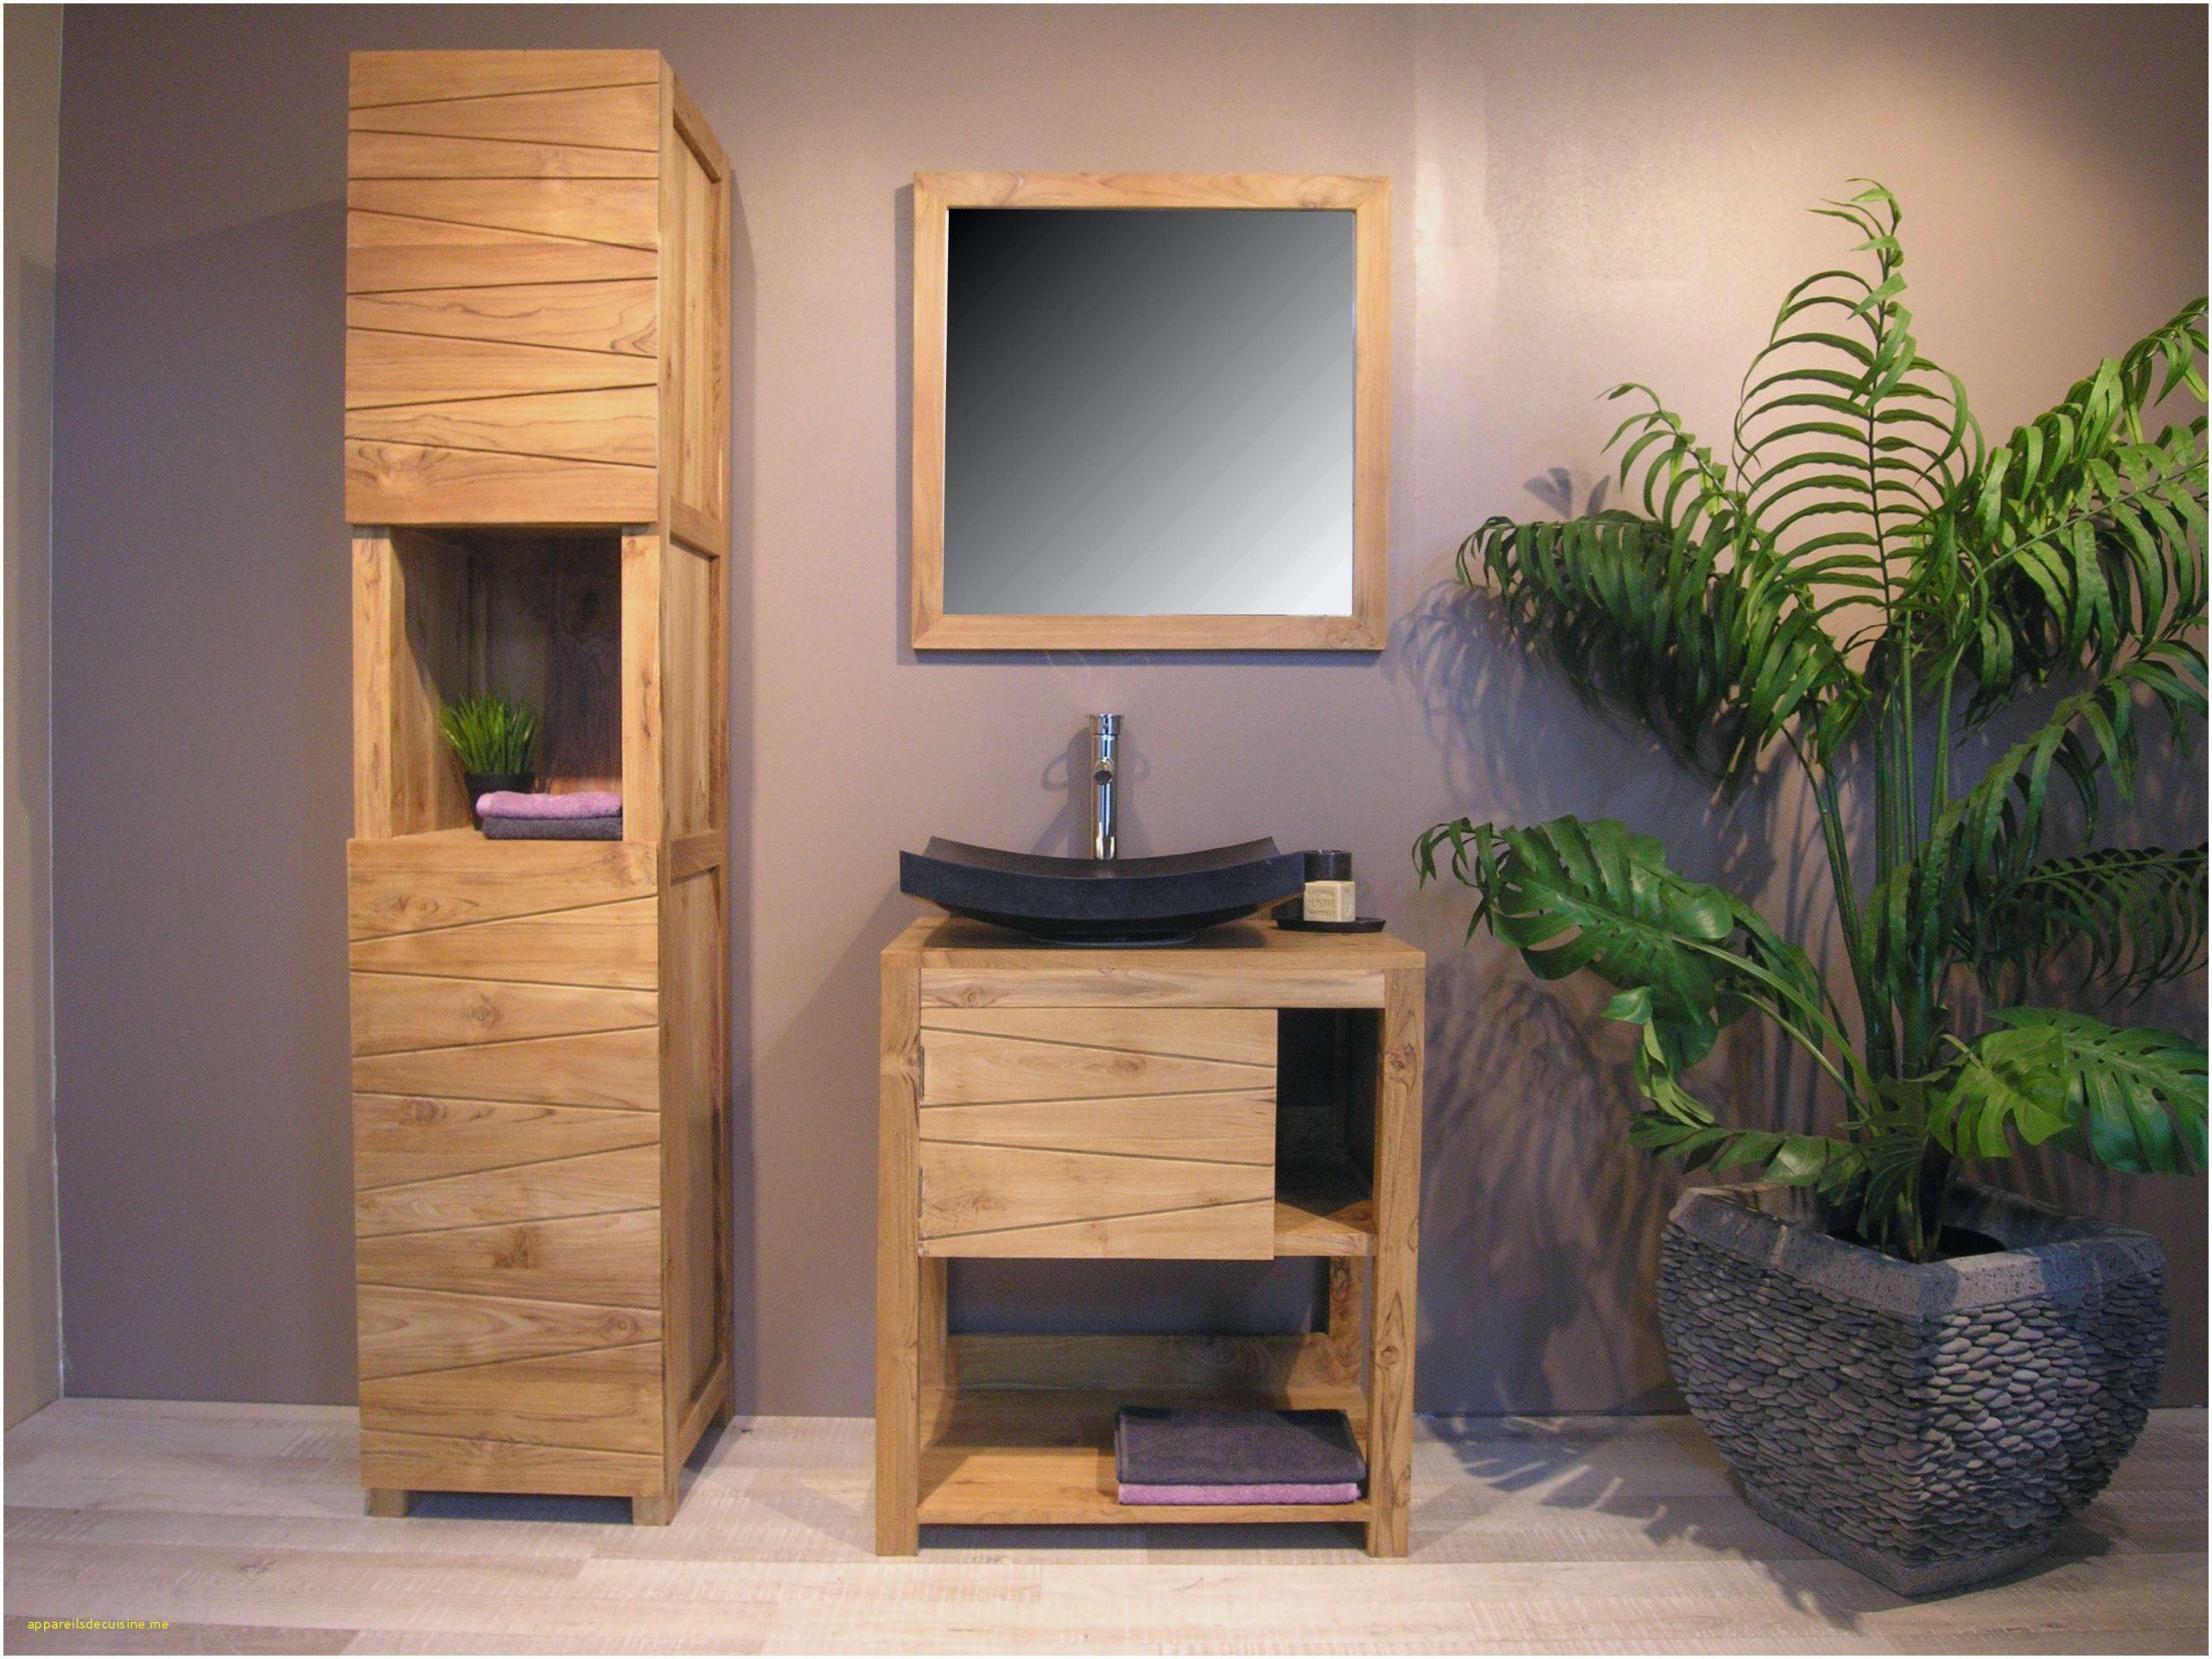 petit meuble bas salon meuble salon angle petit meuble d angle petit meuble chambre s i pinimg 736x ac 0d elegant meuble salon angle petit meuble d angle petit meuble chambre s i pou